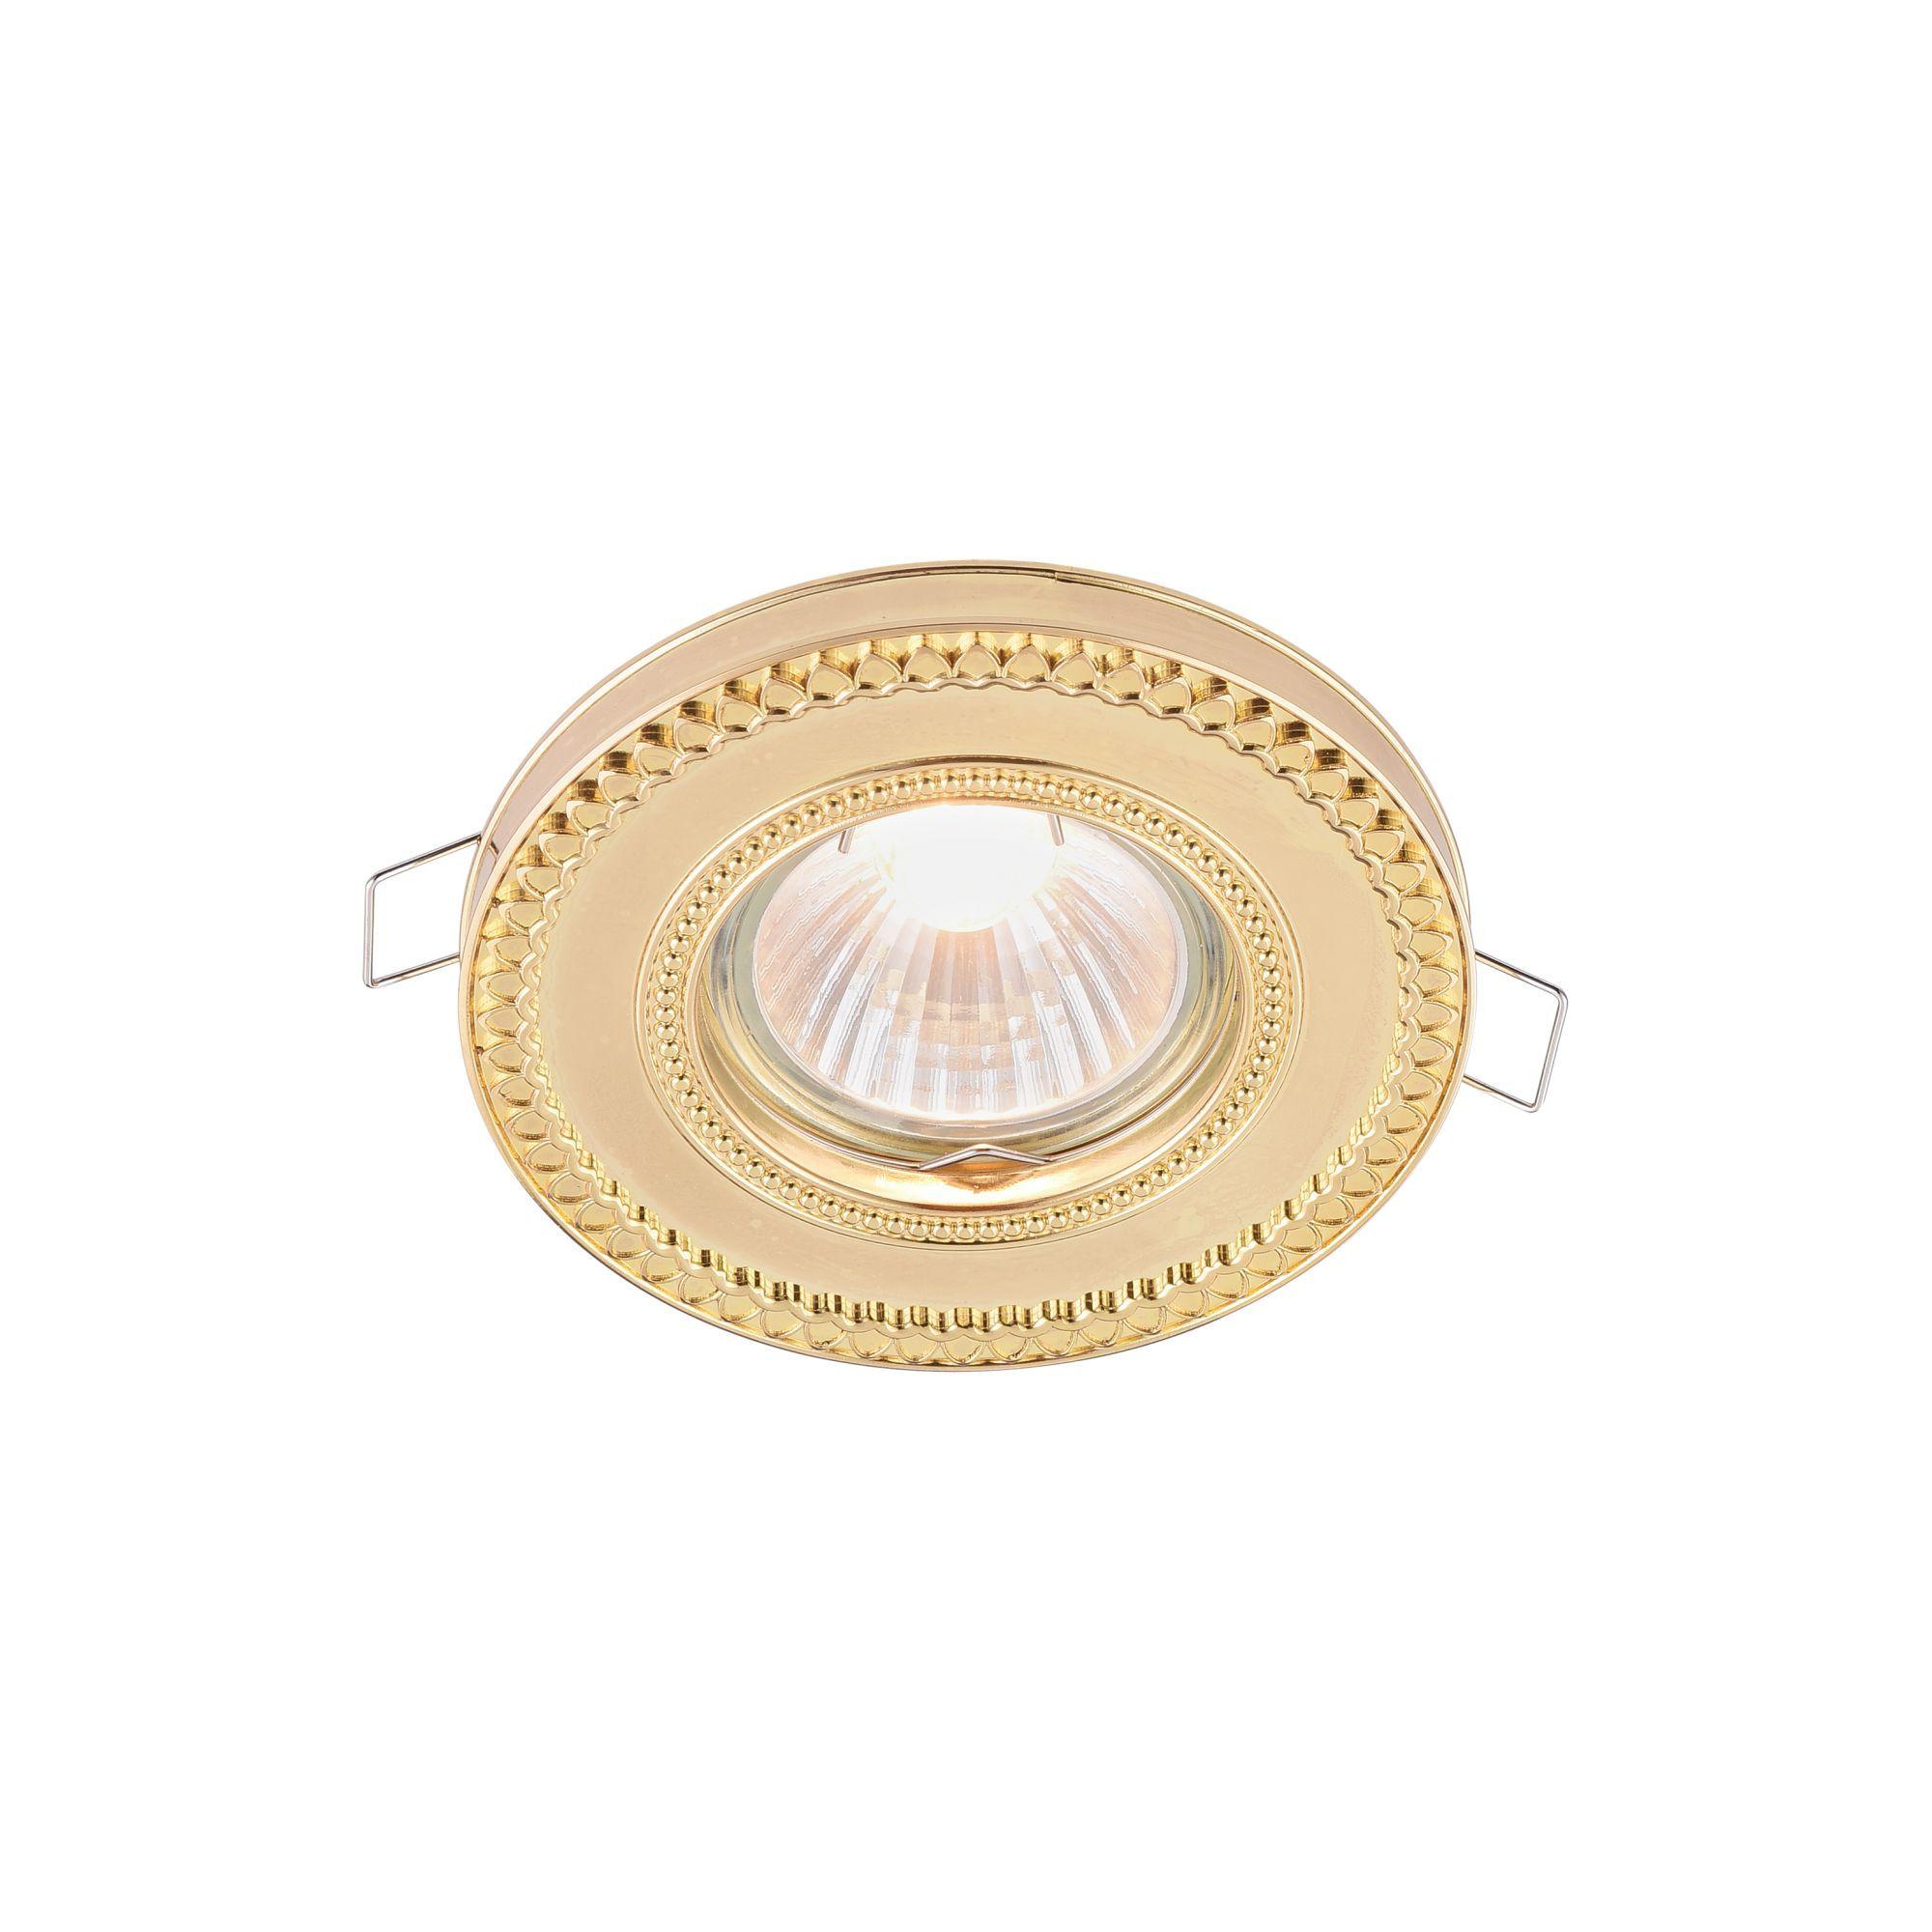 Встраиваемый светильник Maytoni Metal Classic DL302-2-01-G, 1xGU10x50W, золото, металл - фото 1